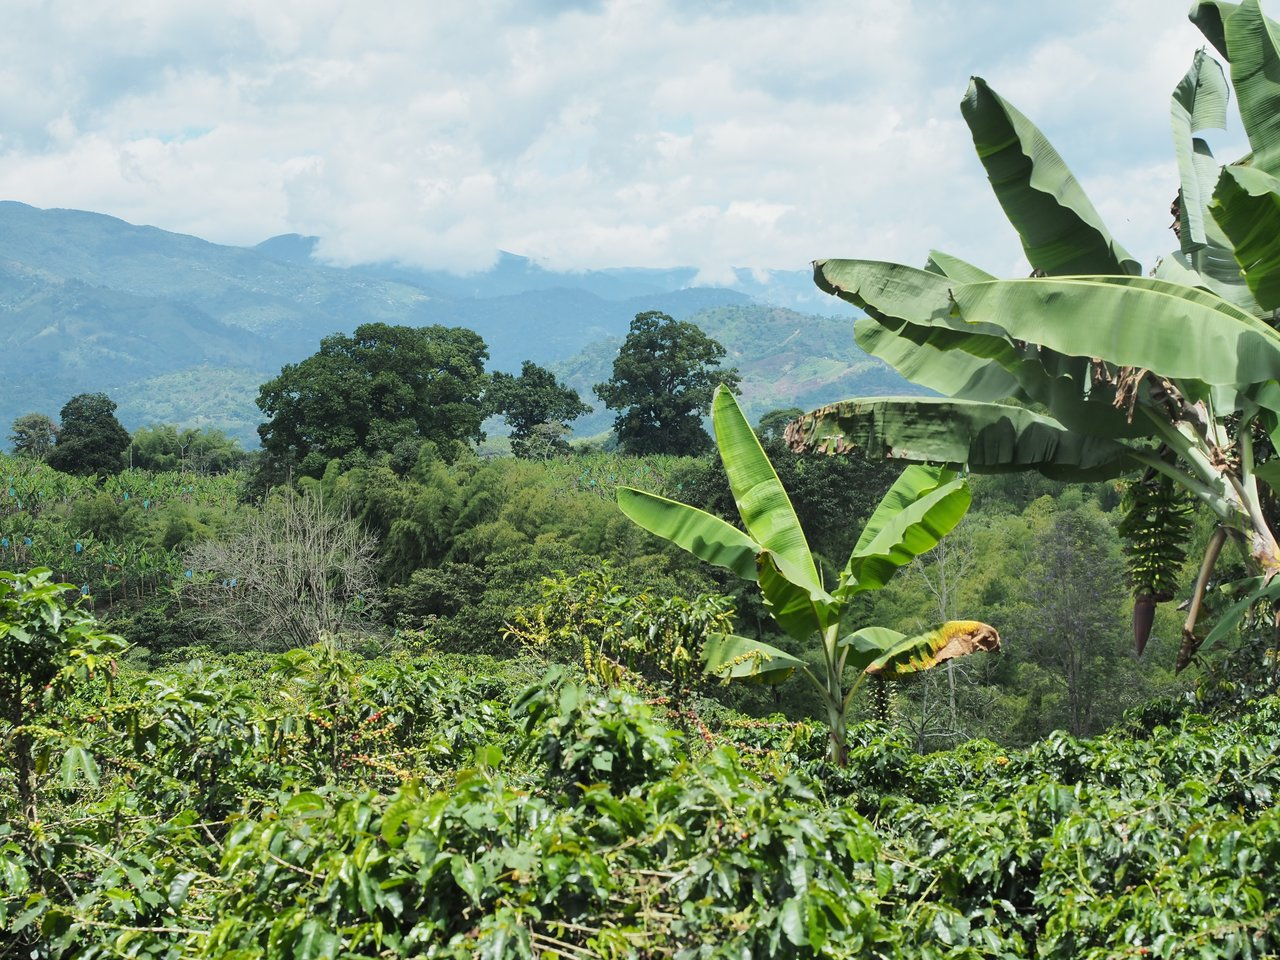 Inspiracion Coffee Hacienda | Photo taken by Peter G